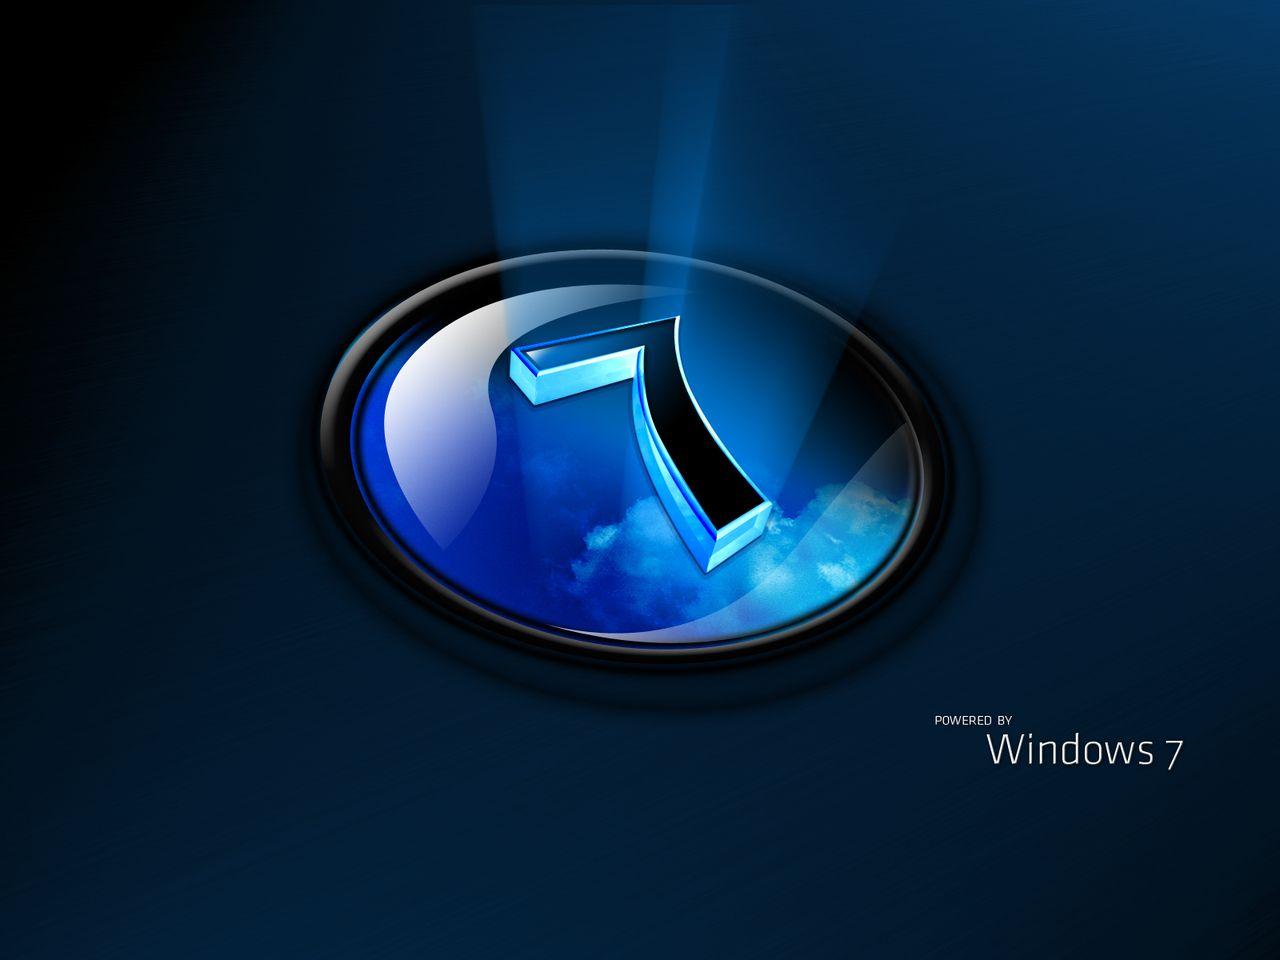 Hd Backgrounds For Windows Most Beautiful Pics Windows HD Earth Live Wallpaper, 3d Desktop Wallpaper